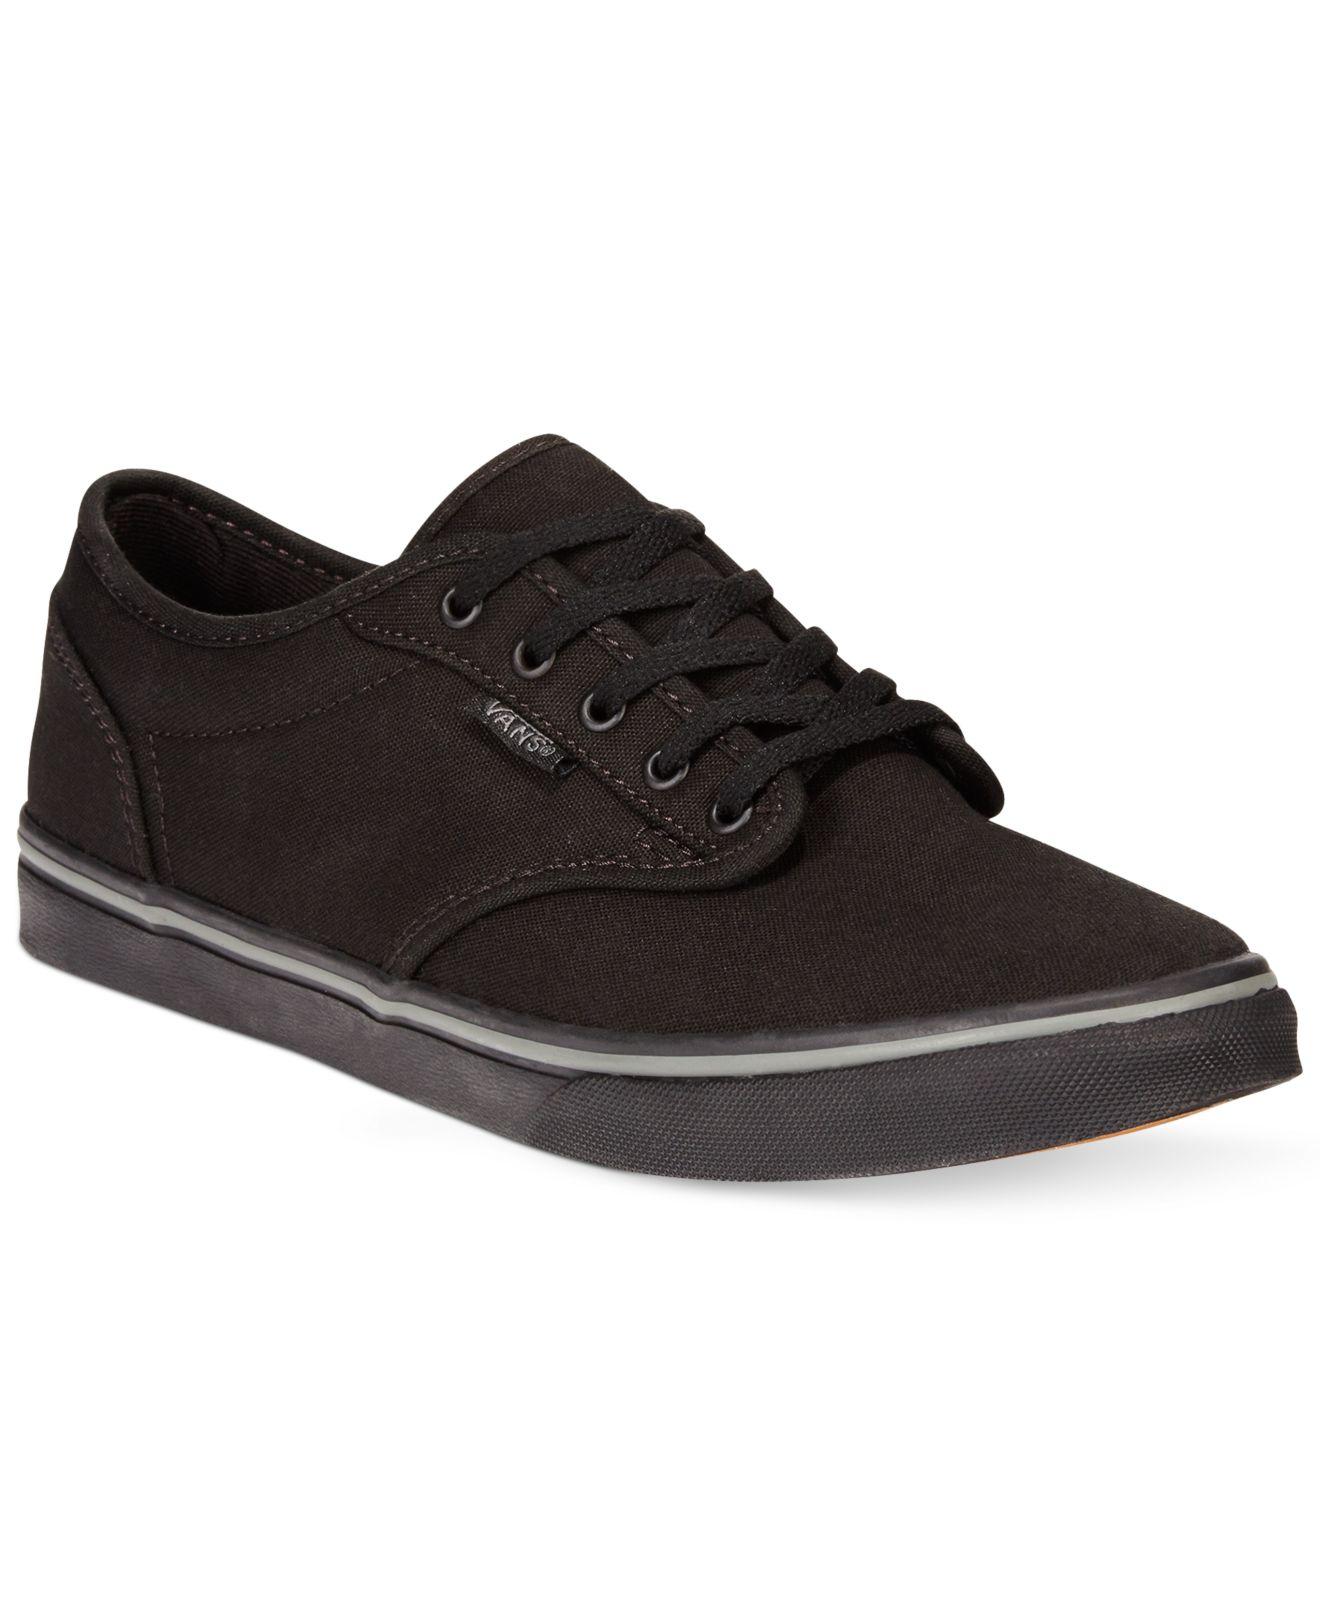 vans atwood low suede sneaker